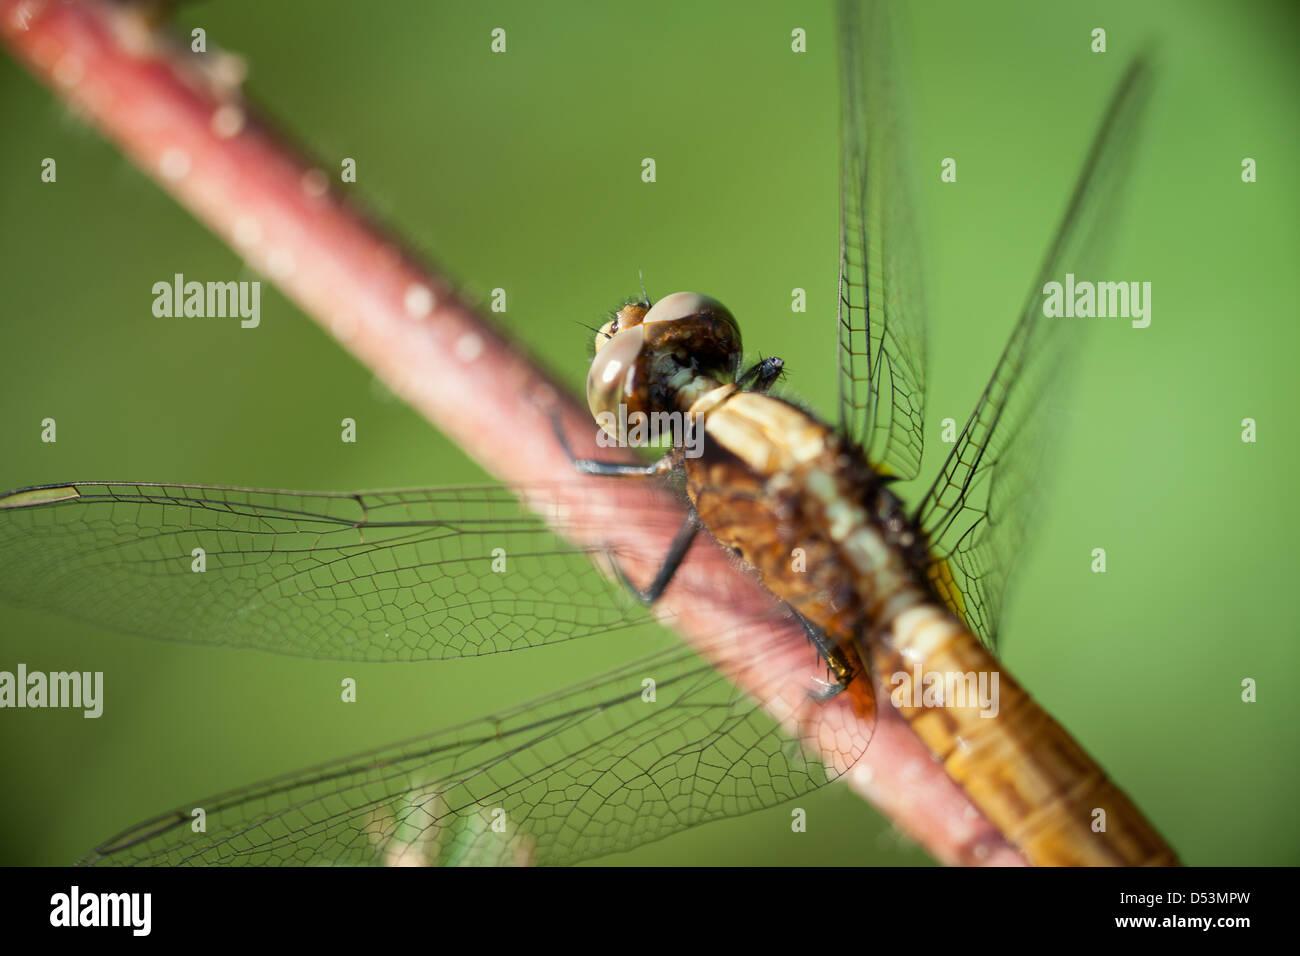 Details on a Dragonfly at Cienaga las Macanas nature reserve, Herrera province, Republic of Panama. Stock Photo